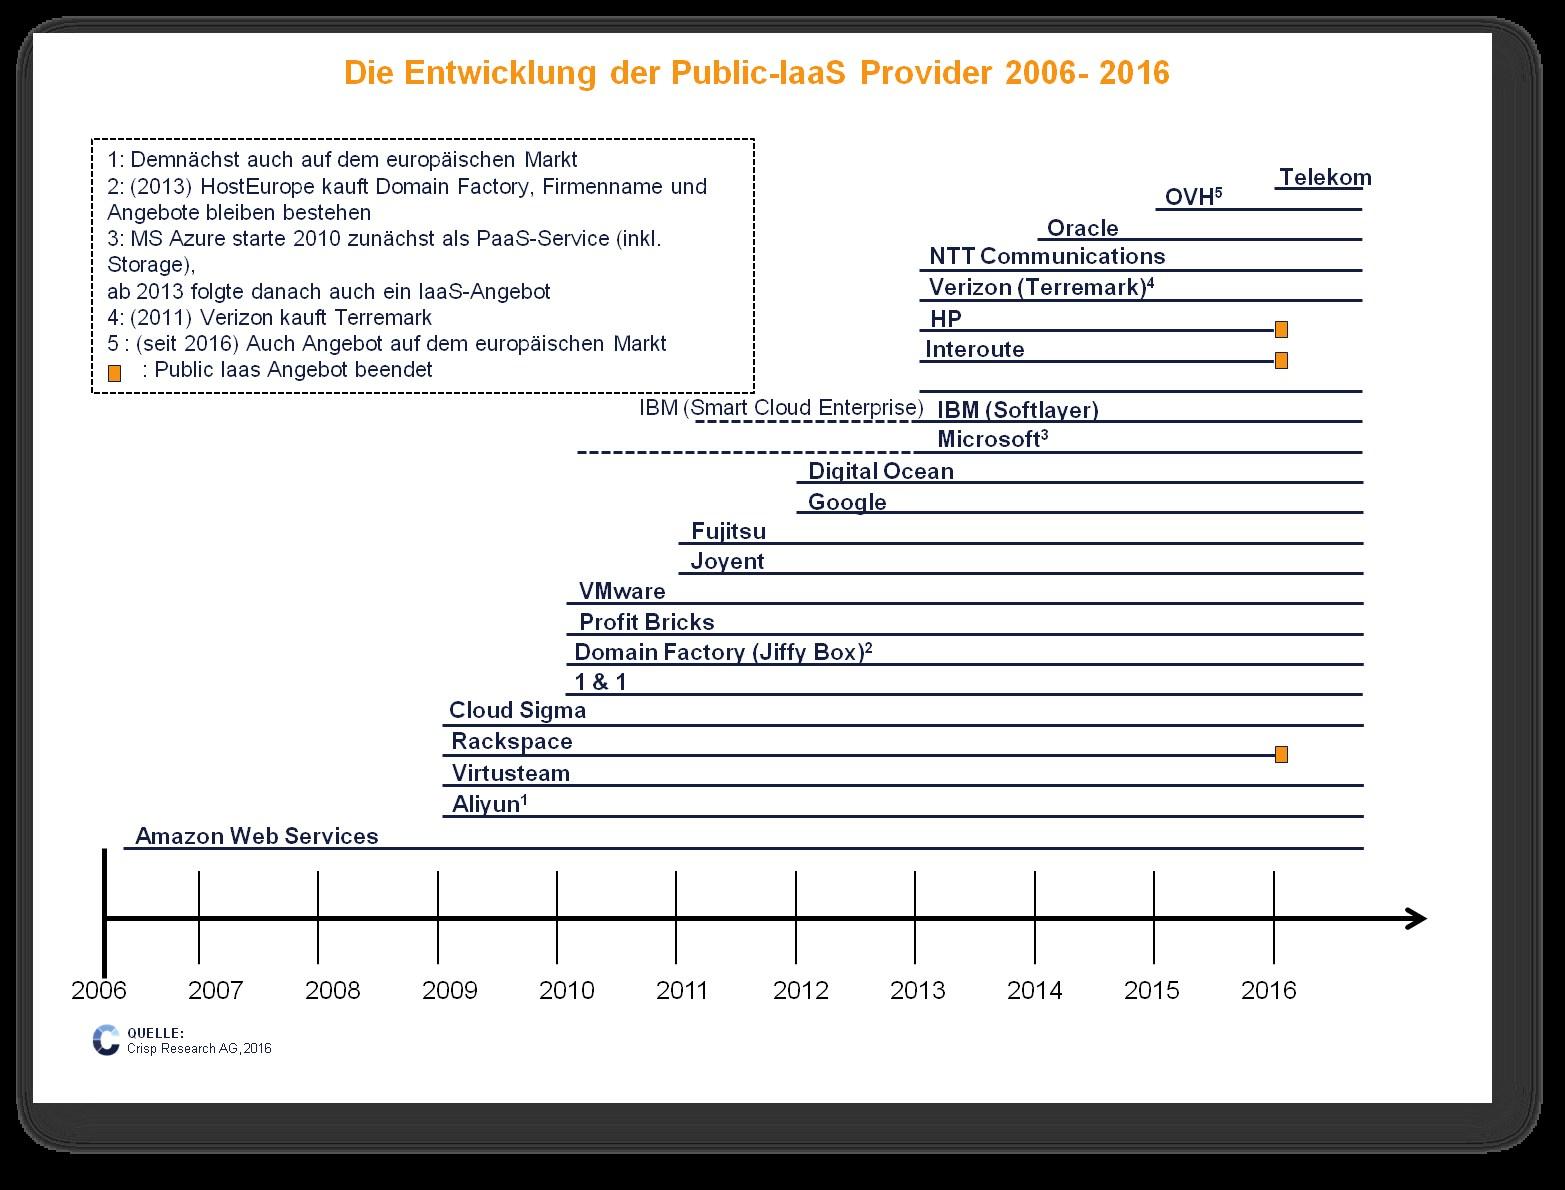 grafik crisp iaas provider 2006 - 2016